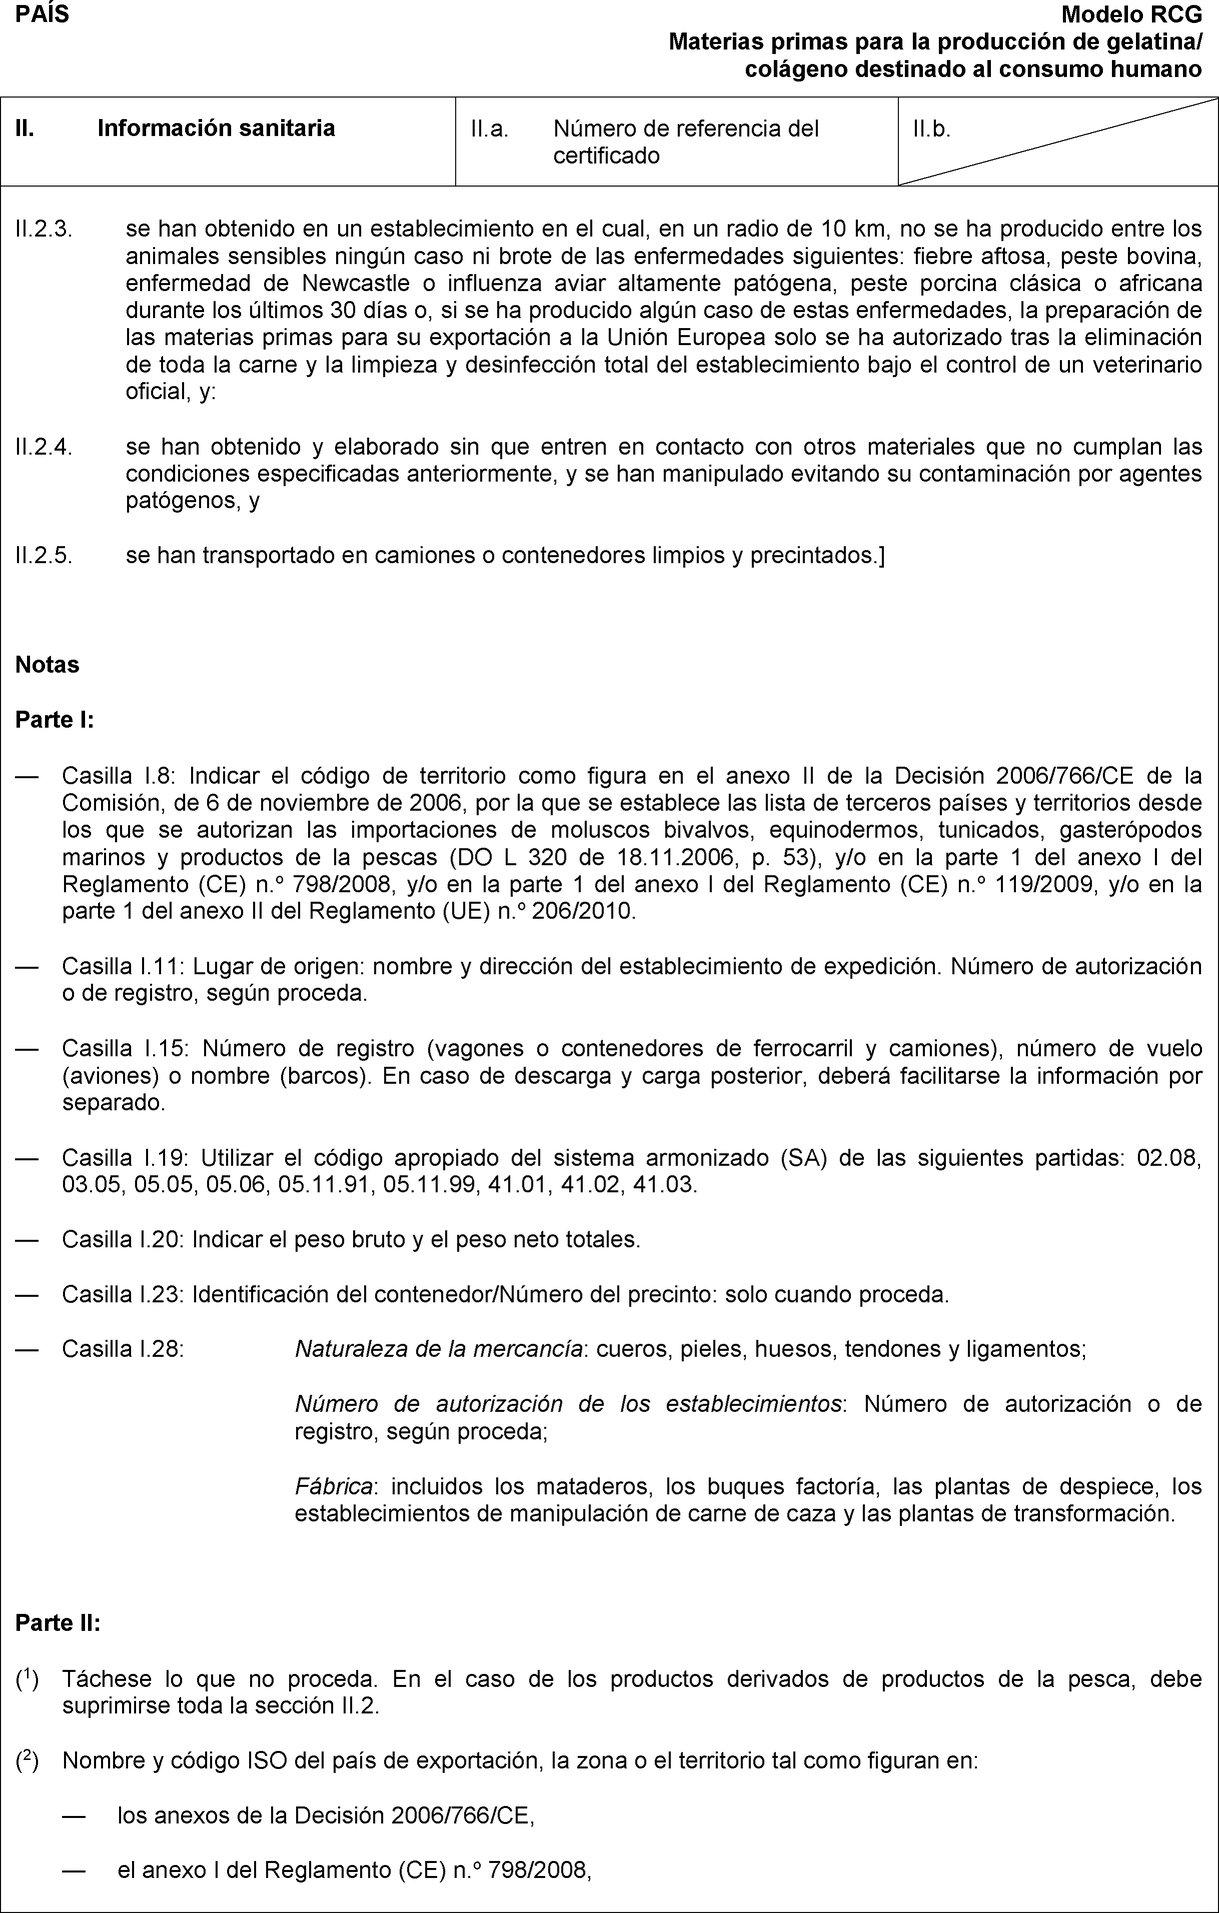 EUR-Lex - 32016R0759 - EN - EUR-Lex